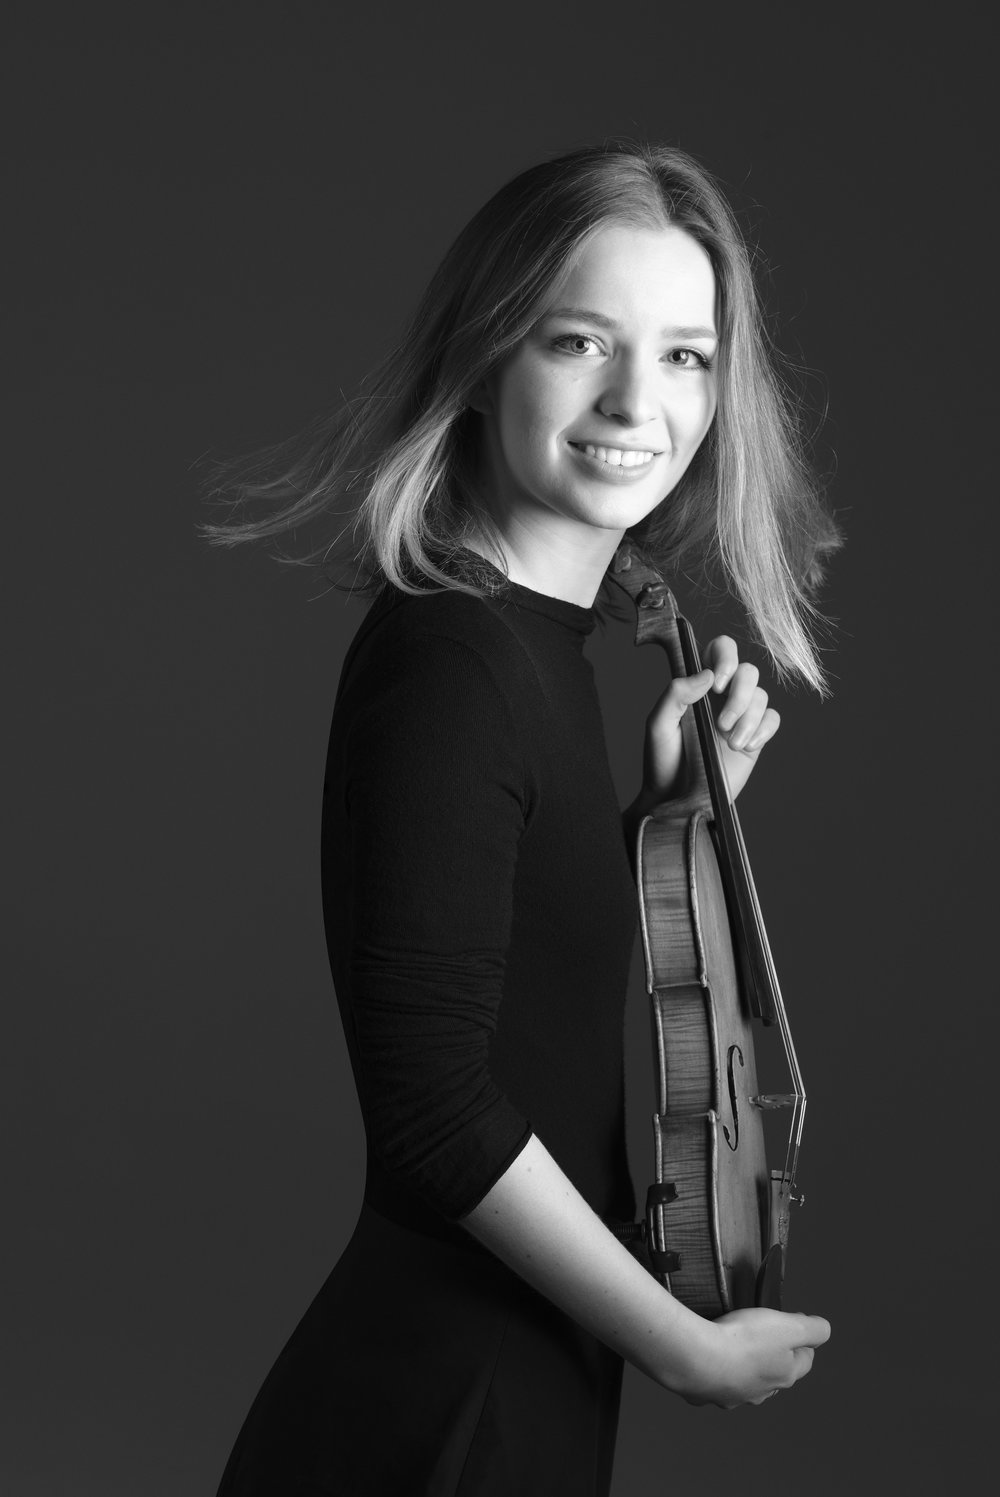 Clara Evens (viool)